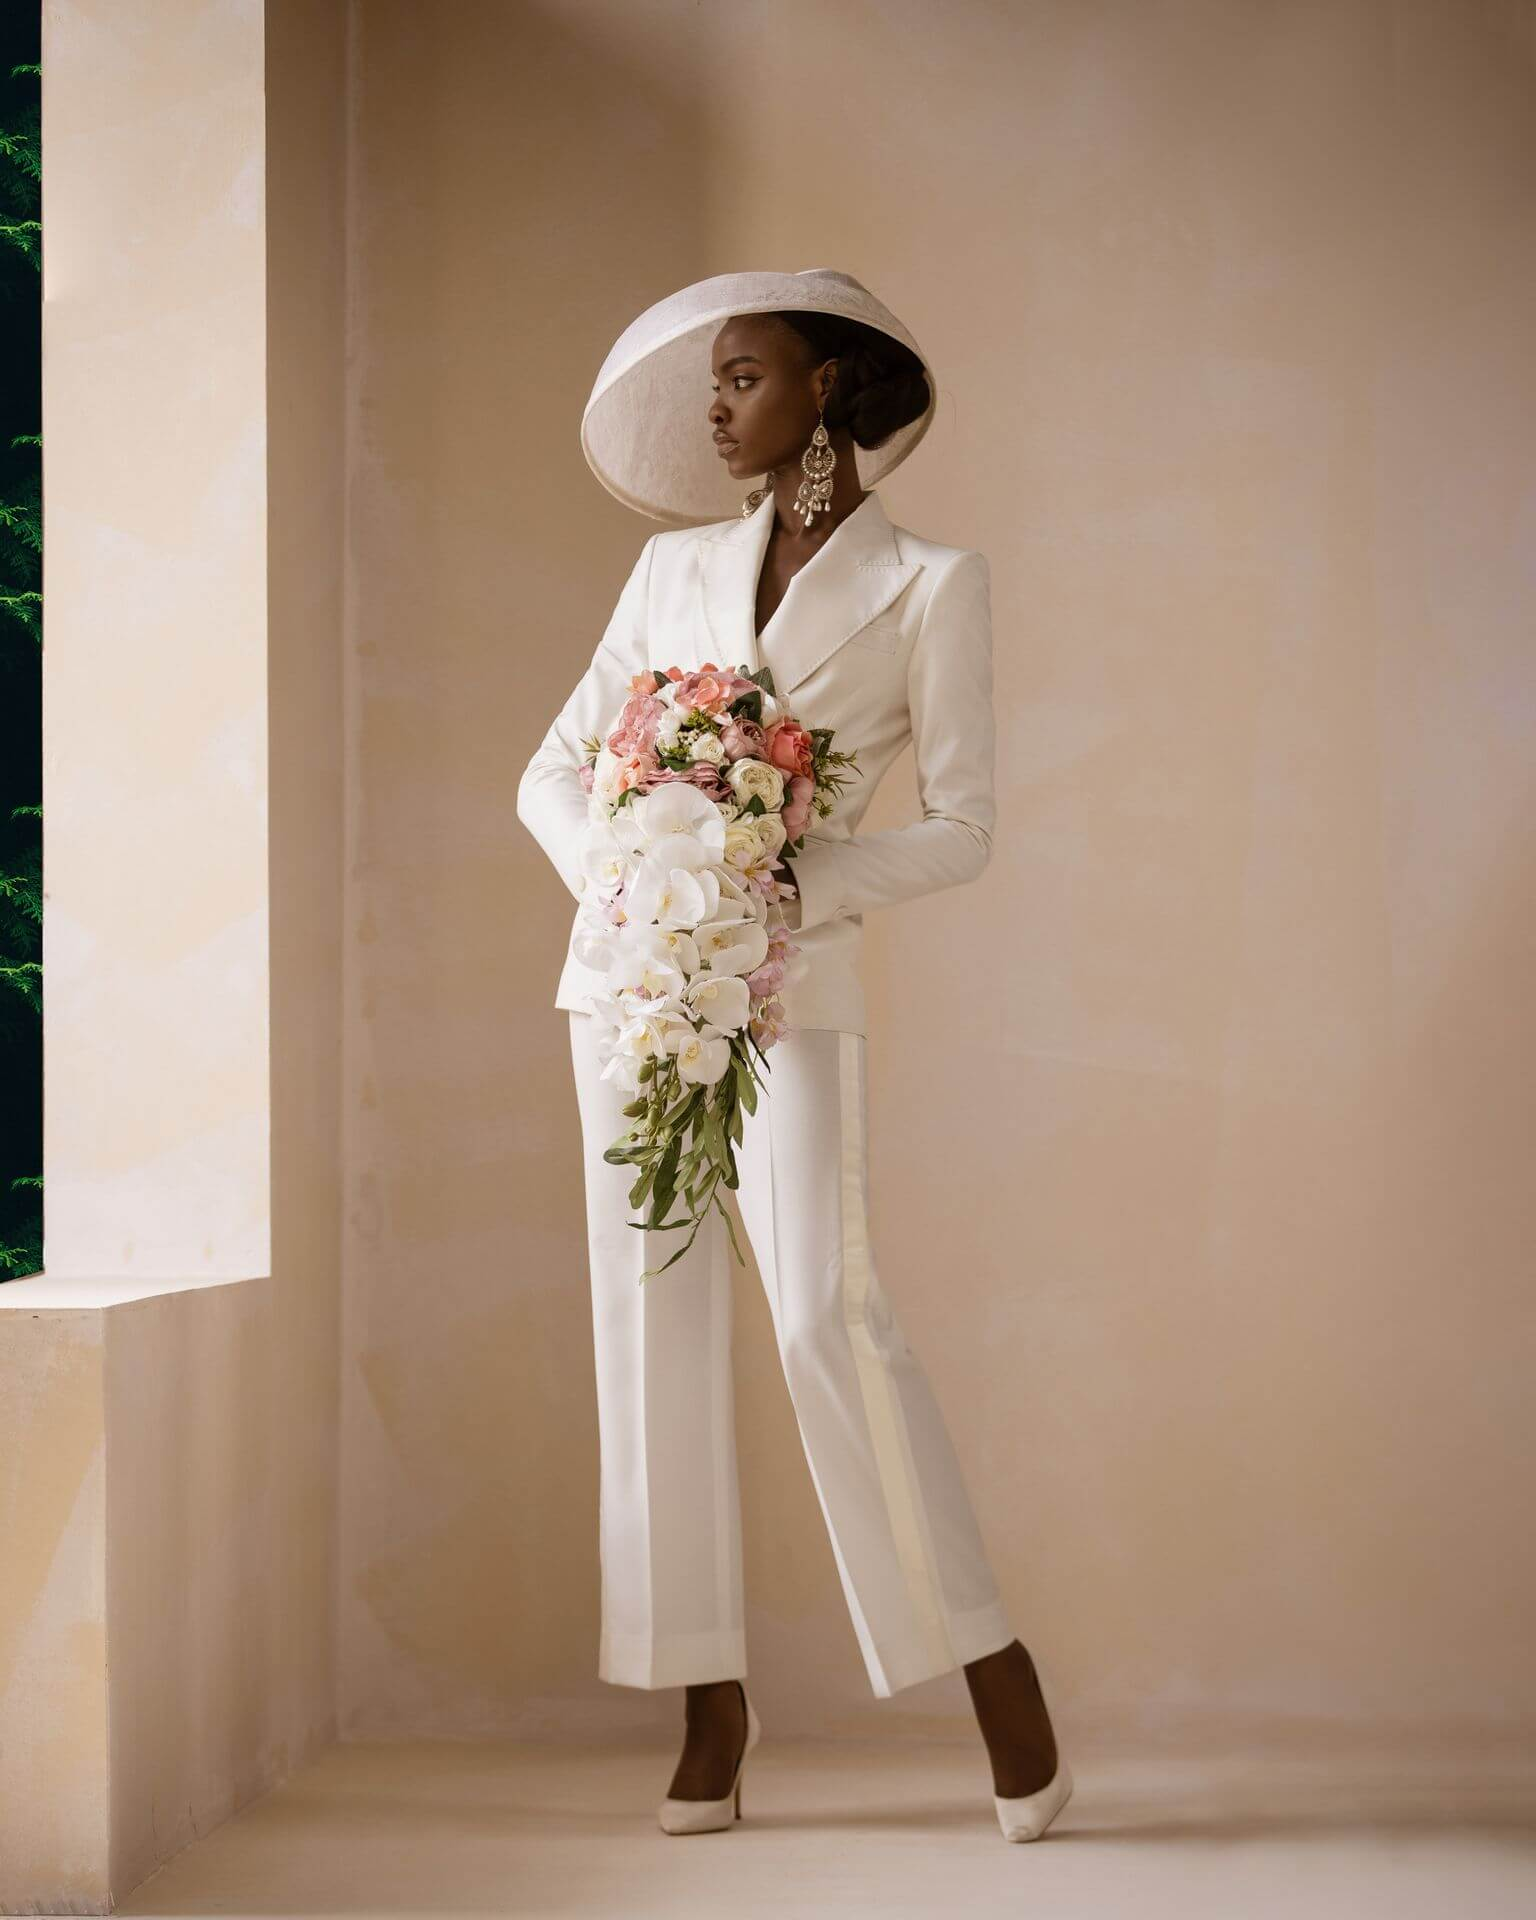 White Bridal Pantsuit for Civil Weddin